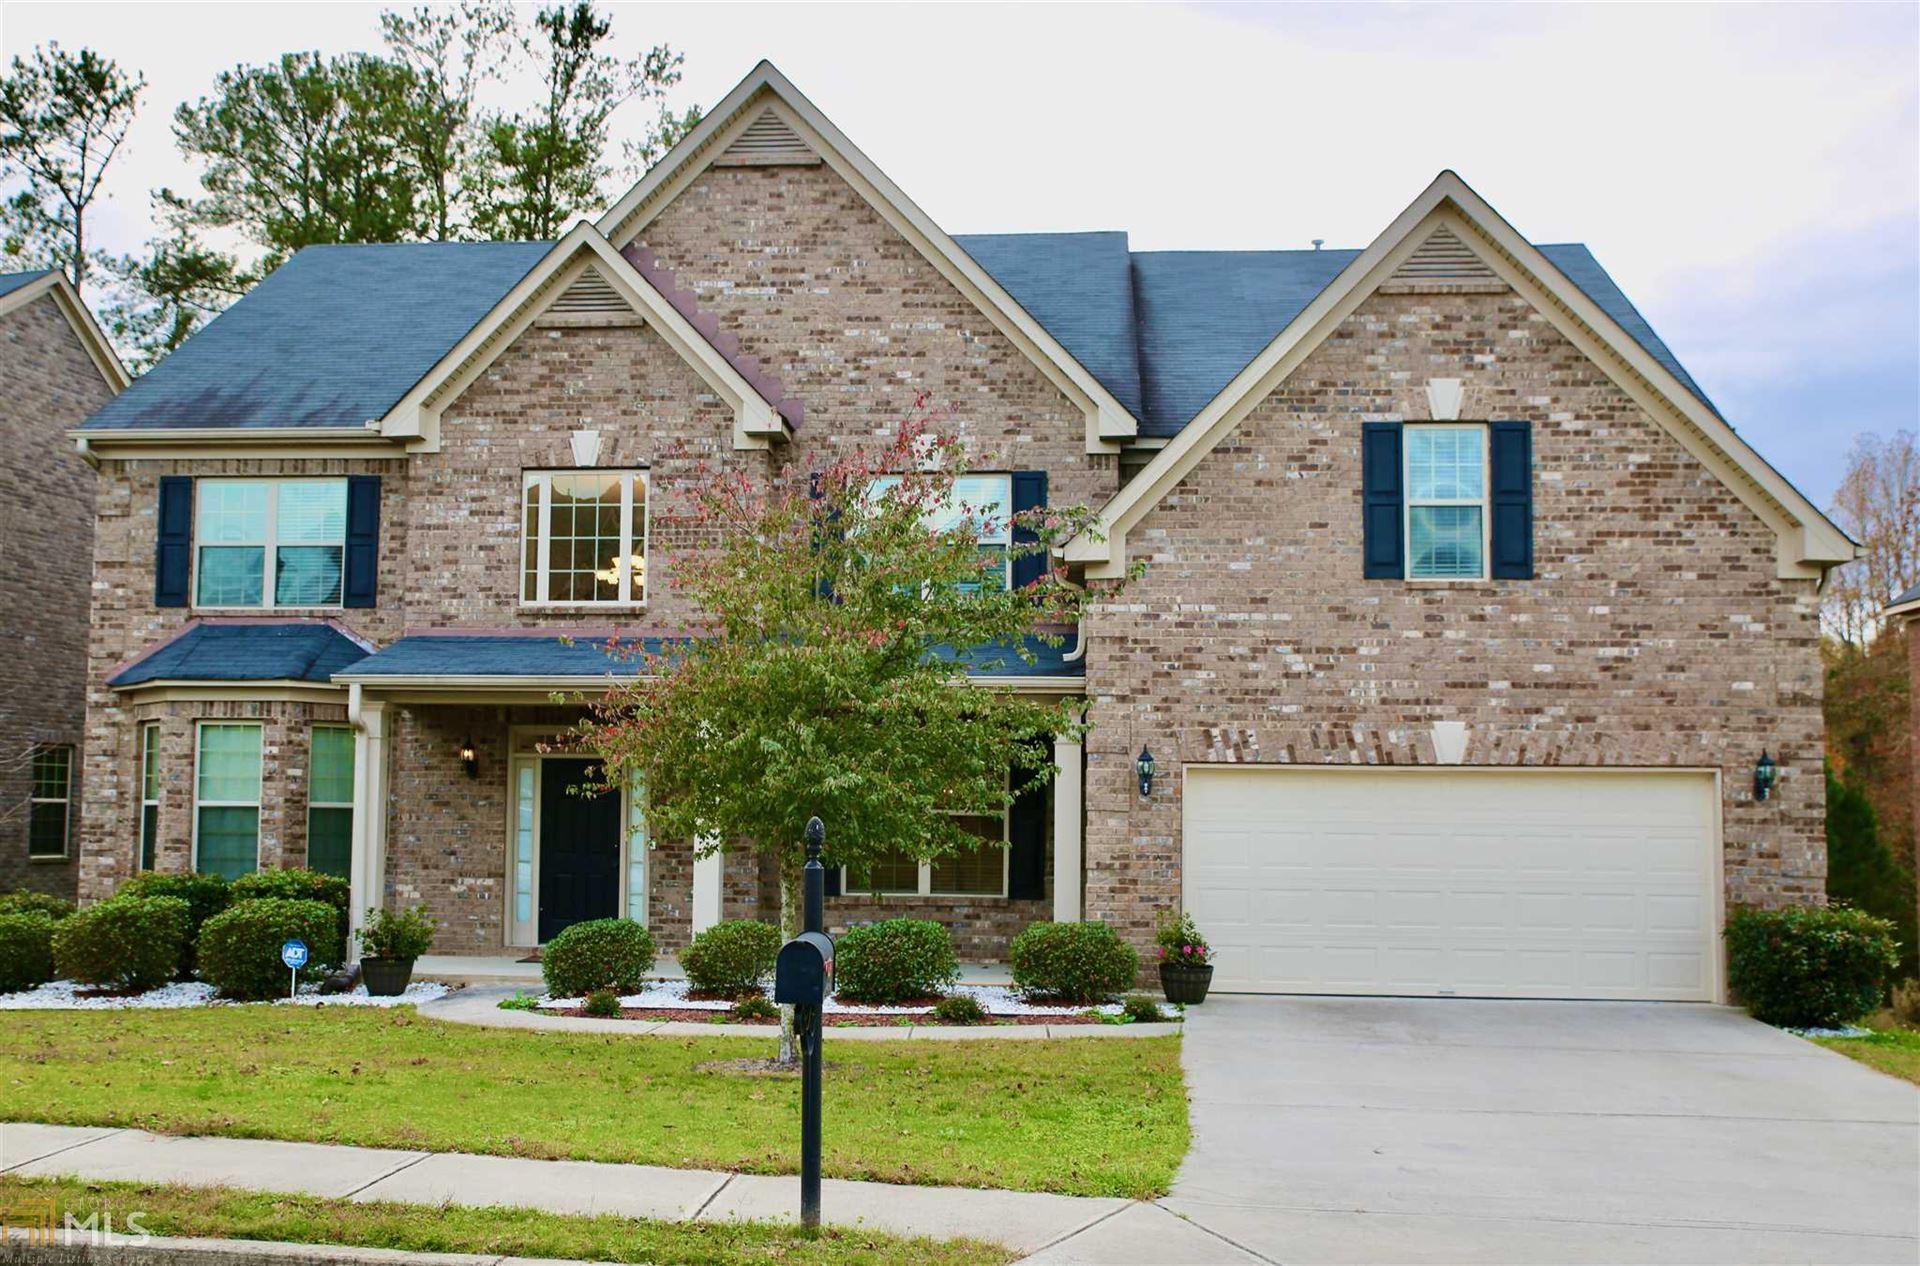 3289 Tuscan Ridge Dr, Snellville, GA 30039 - #: 8887954